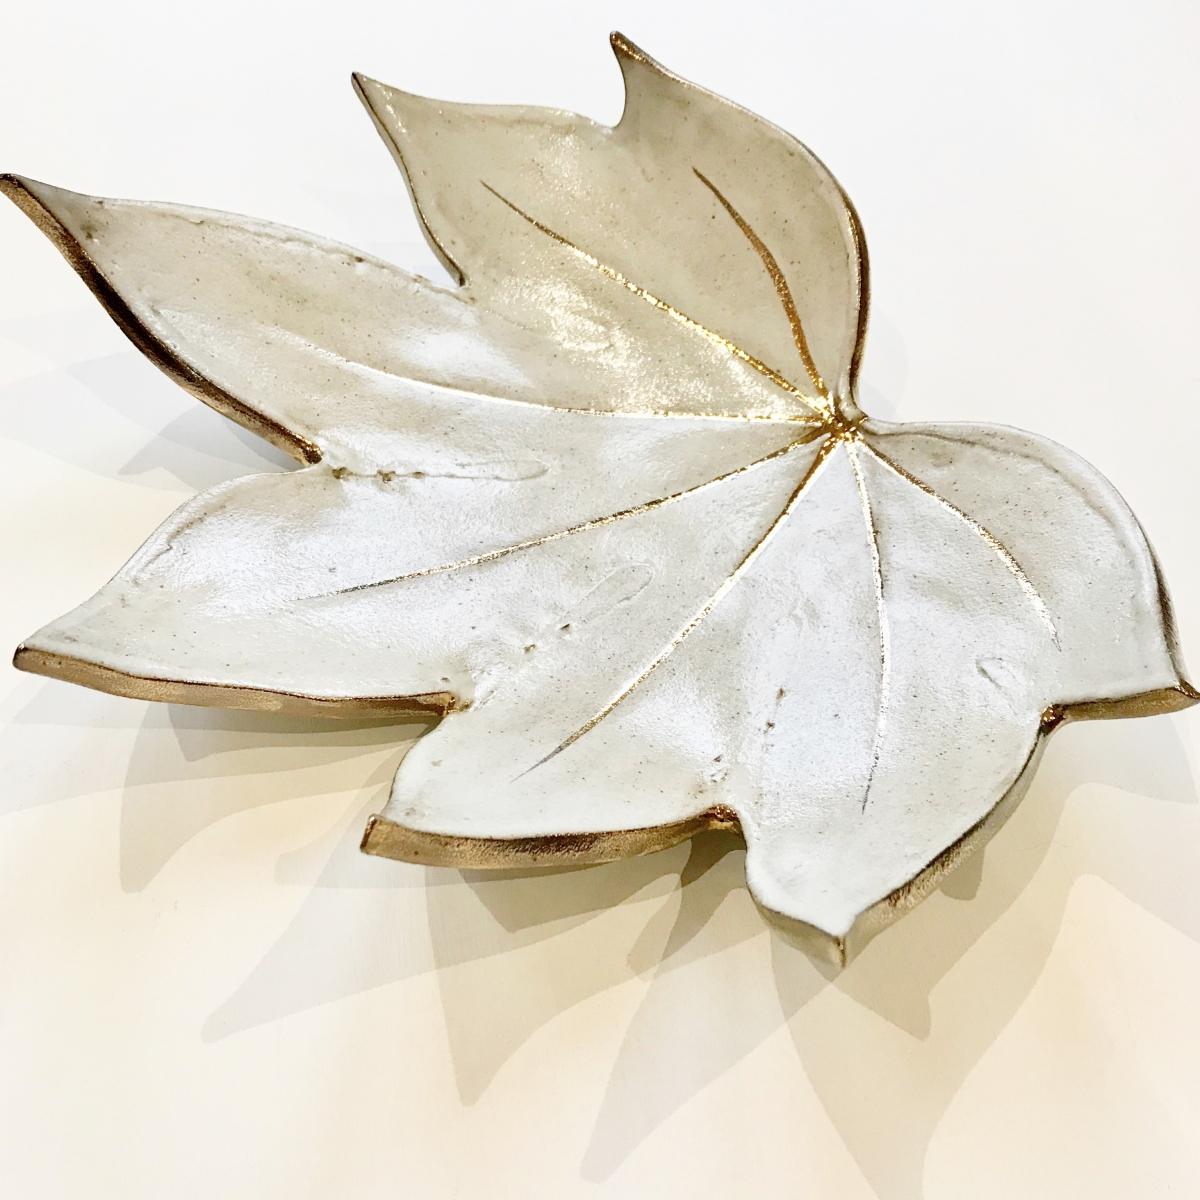 White & Gold Fatsia Leaf Fruit Bowl by Sonya Ceramic Art